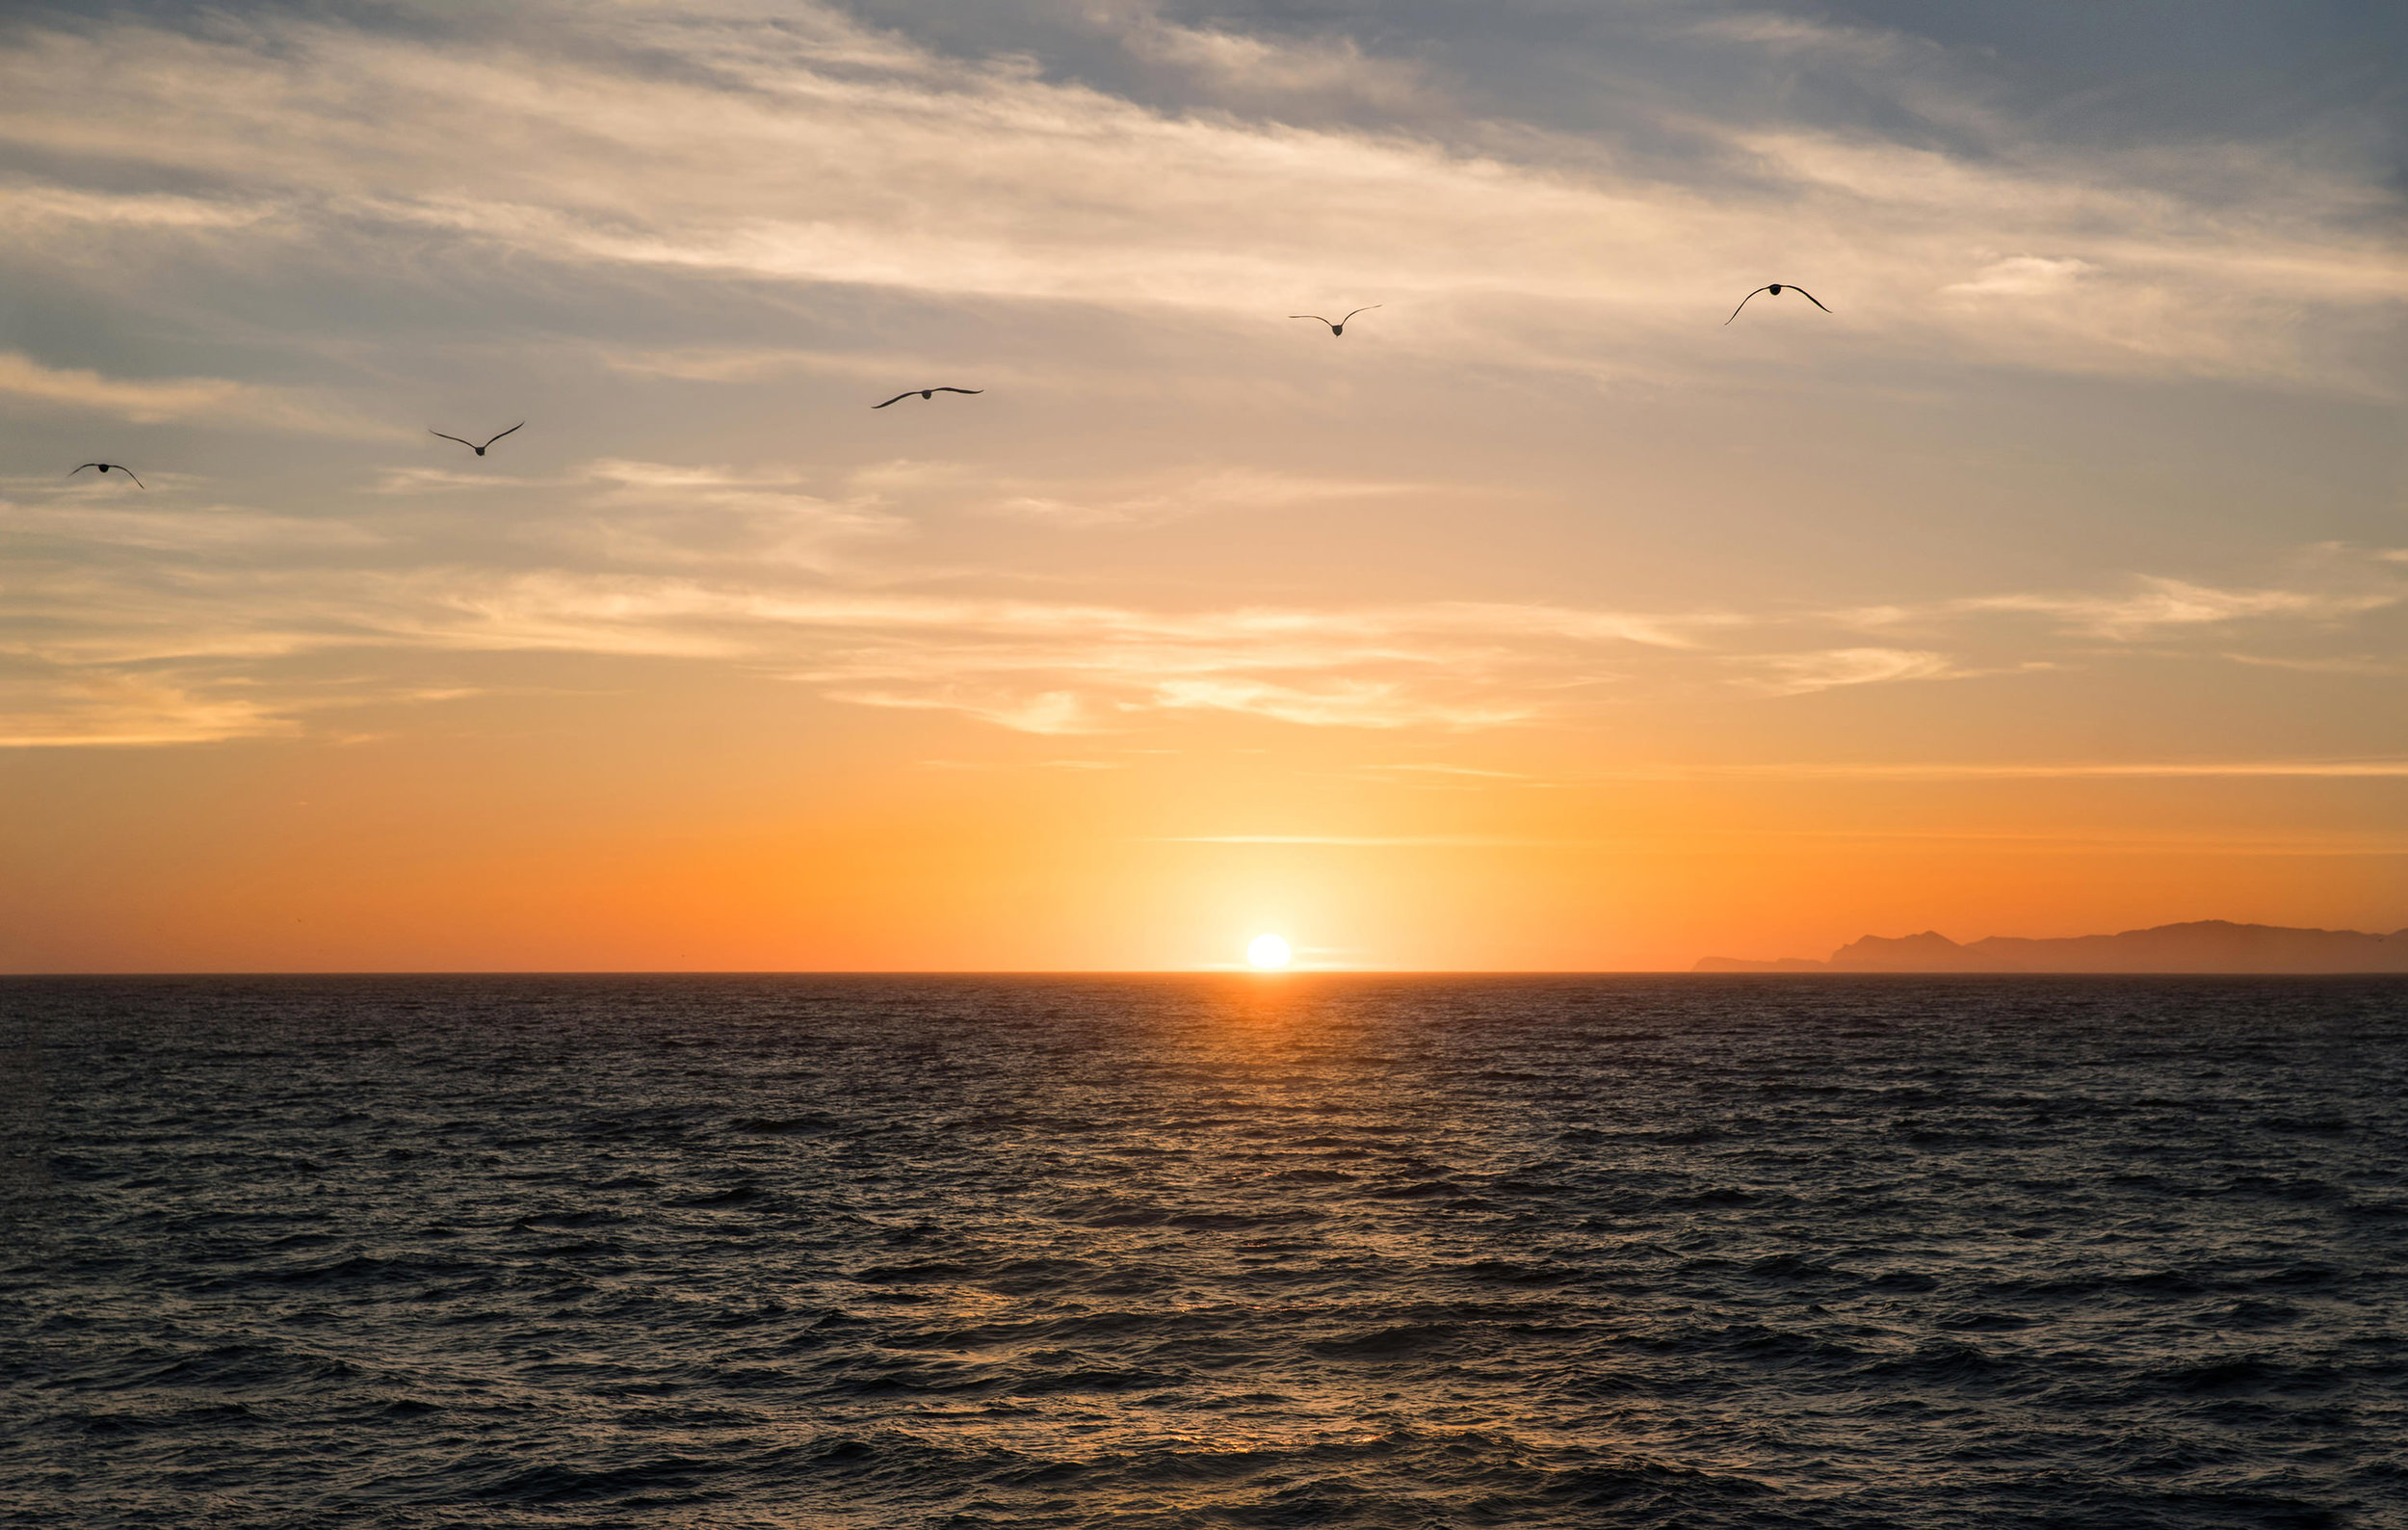 sunsetchannel-islands-reduced-1.jpg